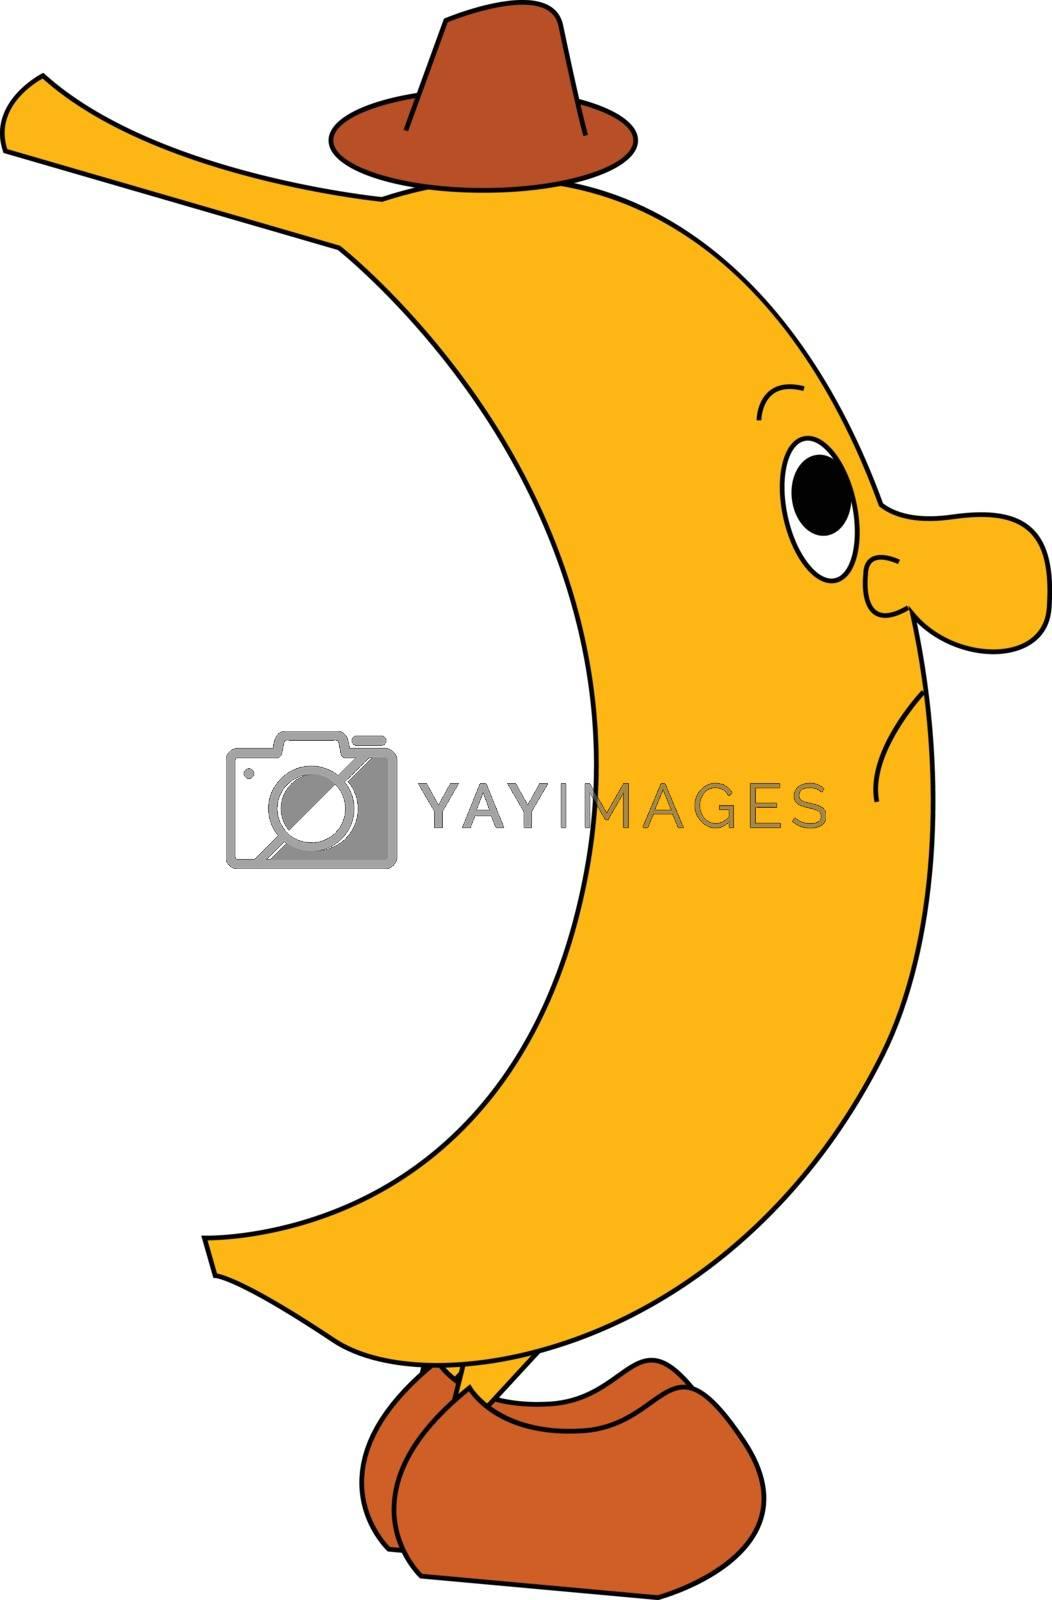 Royalty free image of Emoji of a sad banana vector or color illustration by Morphart